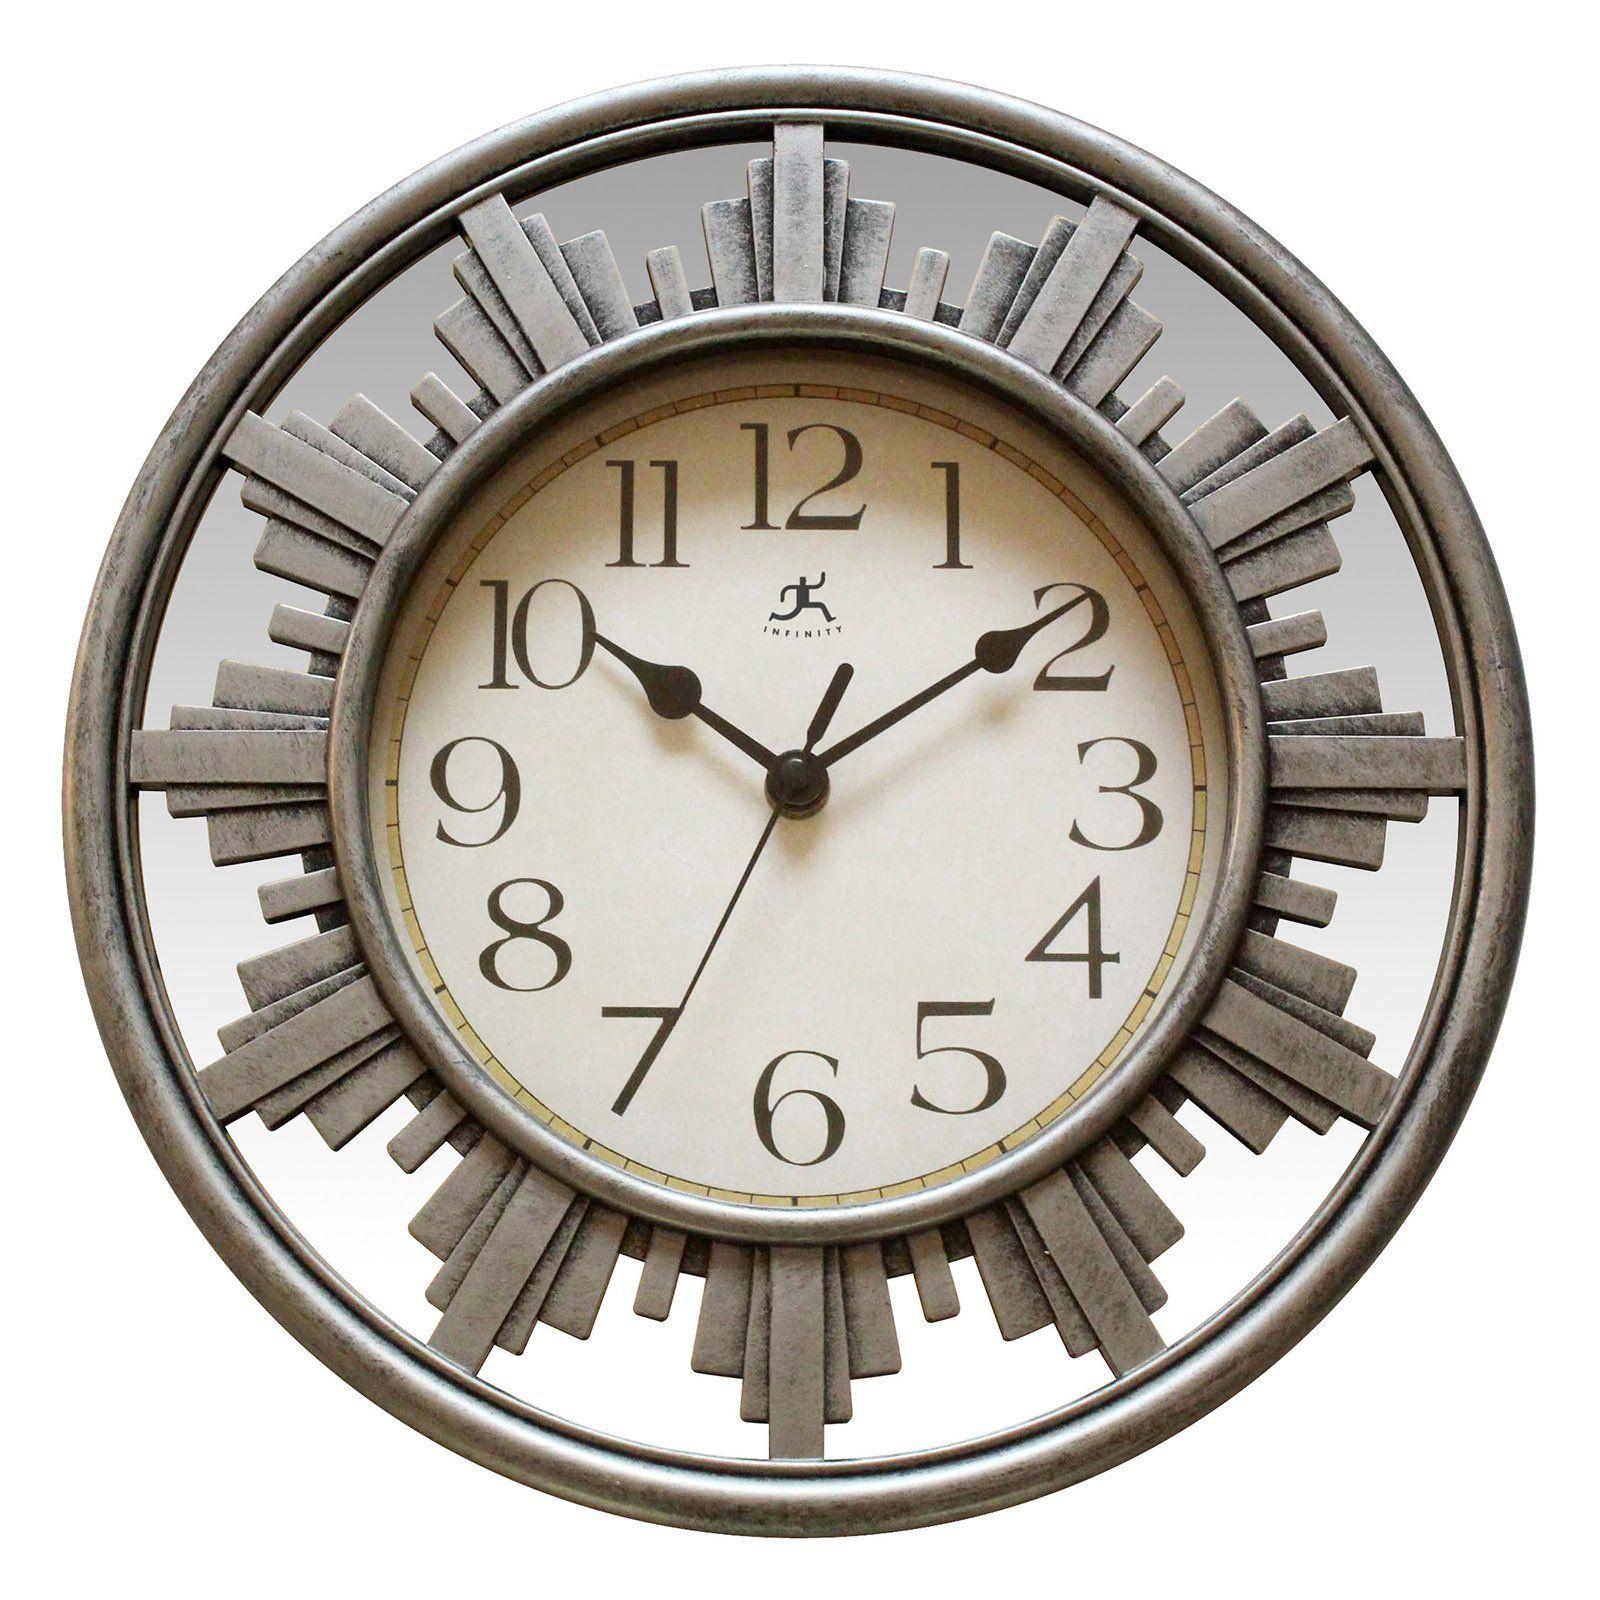 Infinity Instruments City Road Wall Clock From Hayneedle Com Contemporary Traditional Clocks